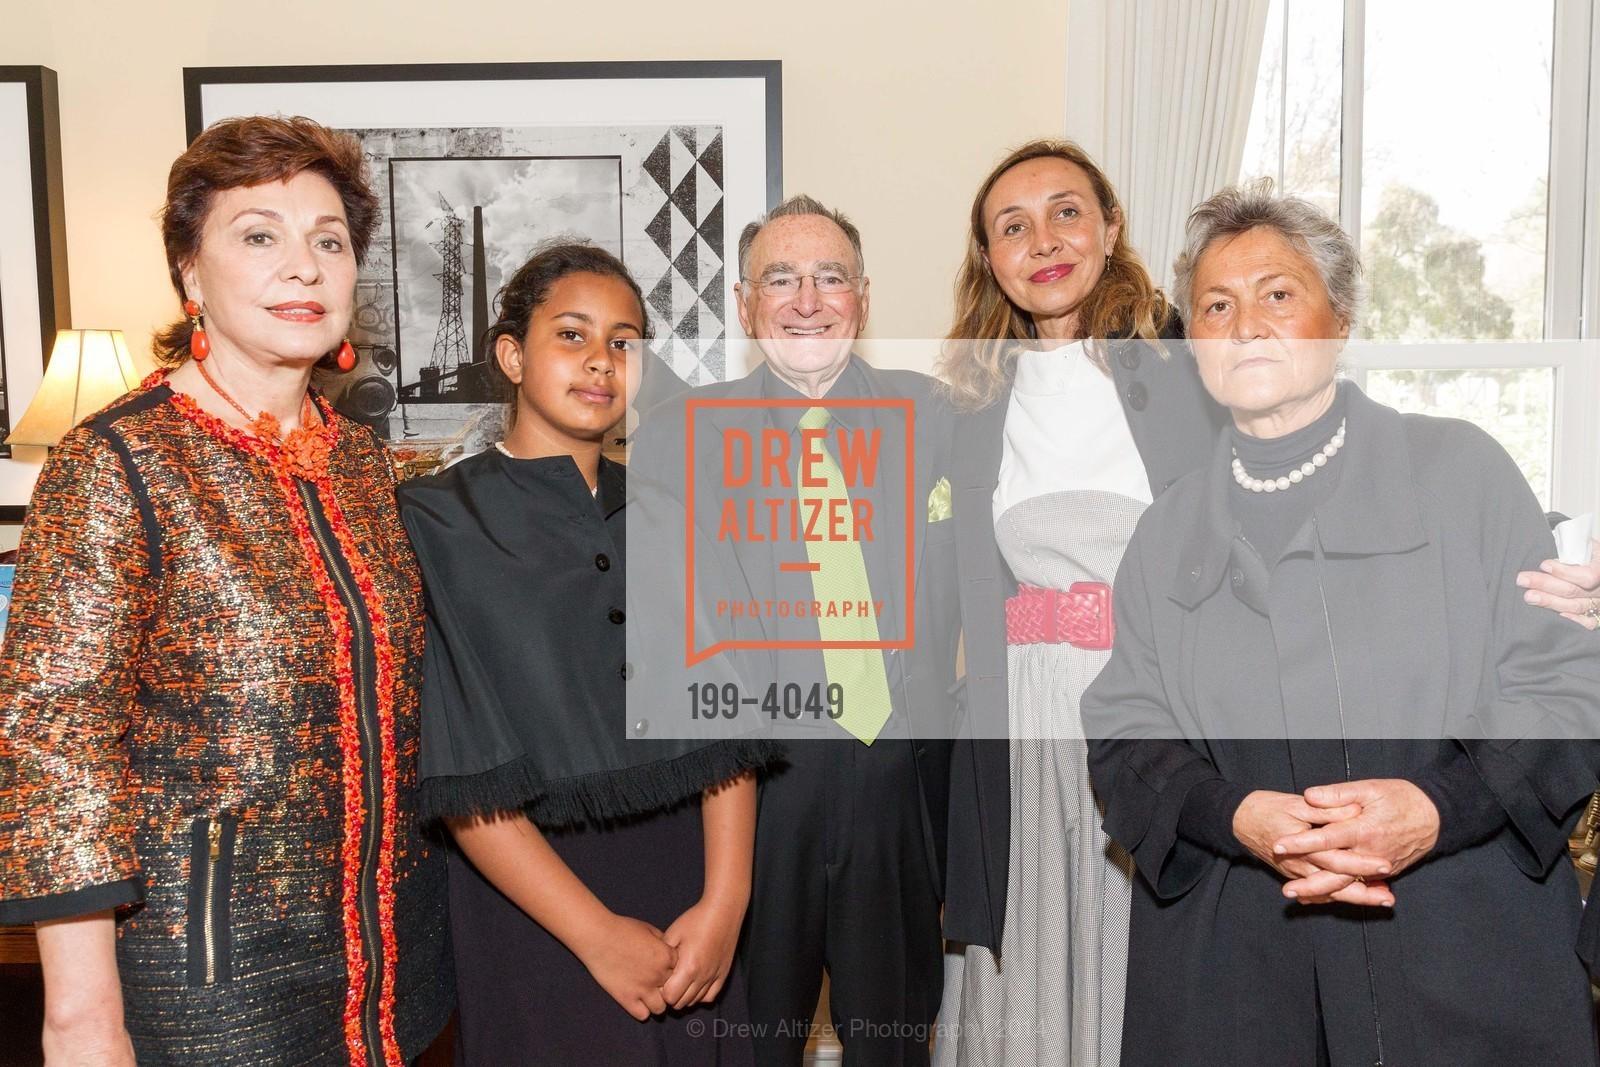 Maria Manetti Shrem, Camilla Ruini, Jan Shrem, Beatrice Ruini, Corina Manetti, Photo #199-4049